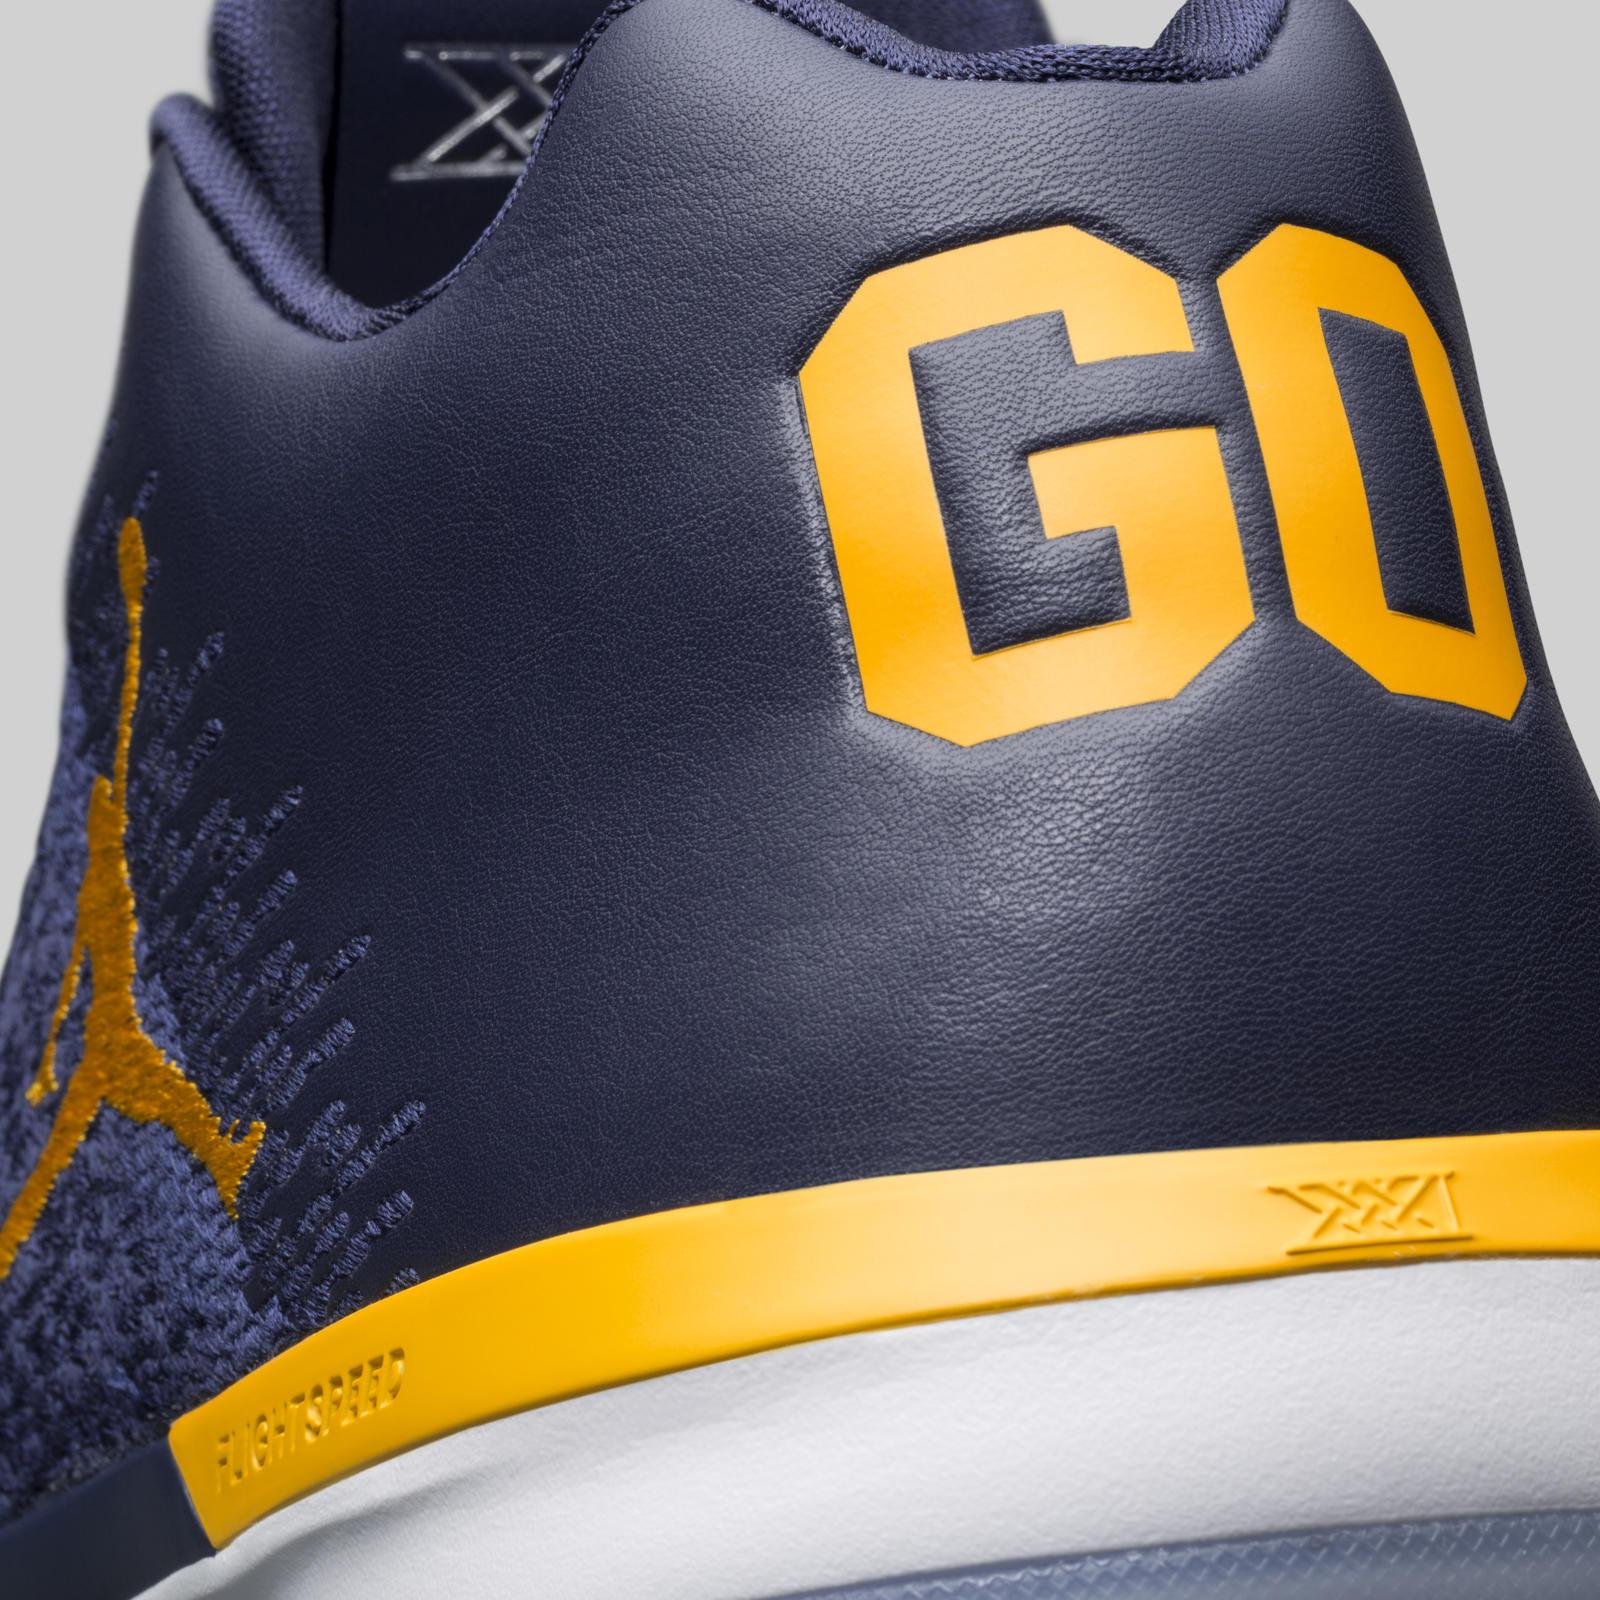 Nike debuts Michigan Wolverines Air Jordan XXXI Low PEs - Maize n Brew 7181c071d